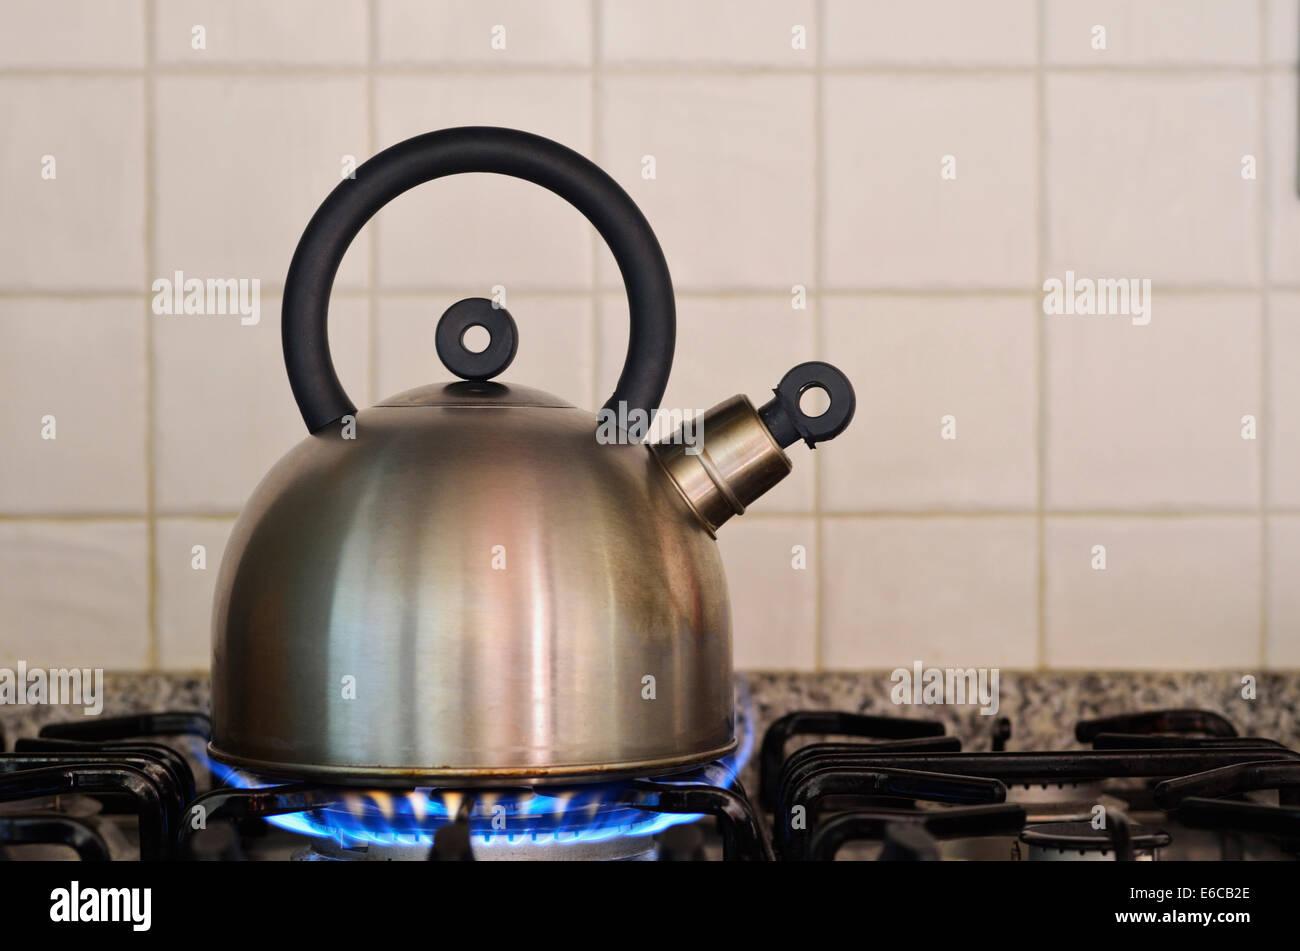 Teapot kettle on gas stove burner - Stock Image